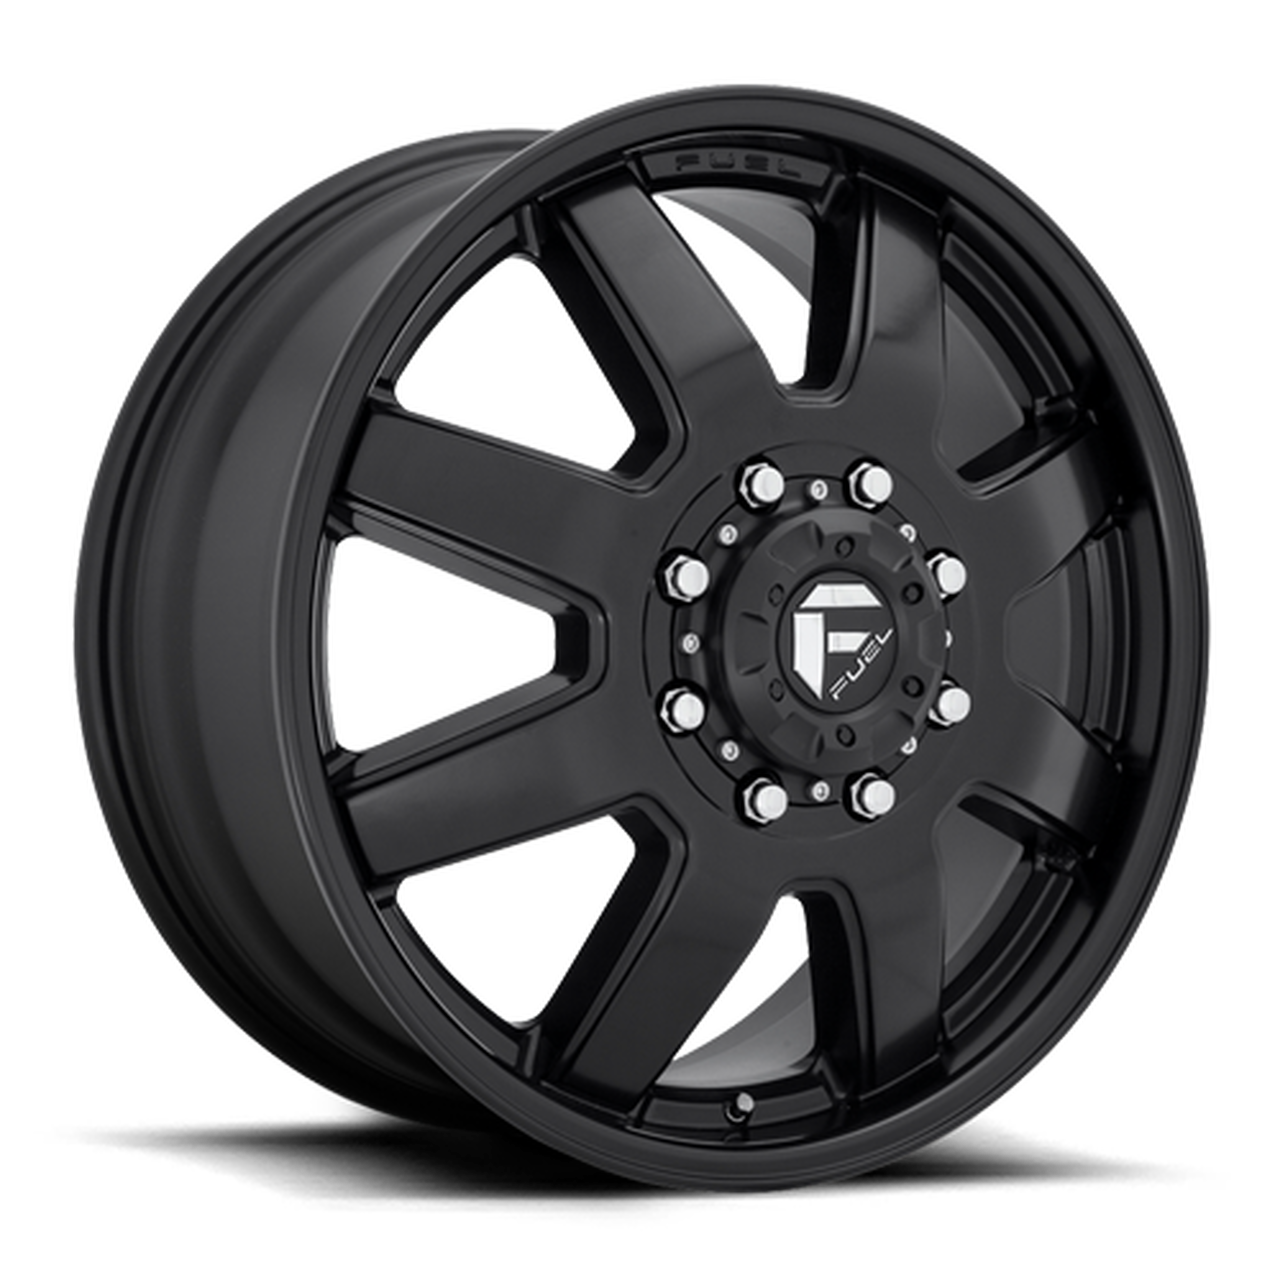 20 x 8.25 Fuel Maverick D436 Matte Black